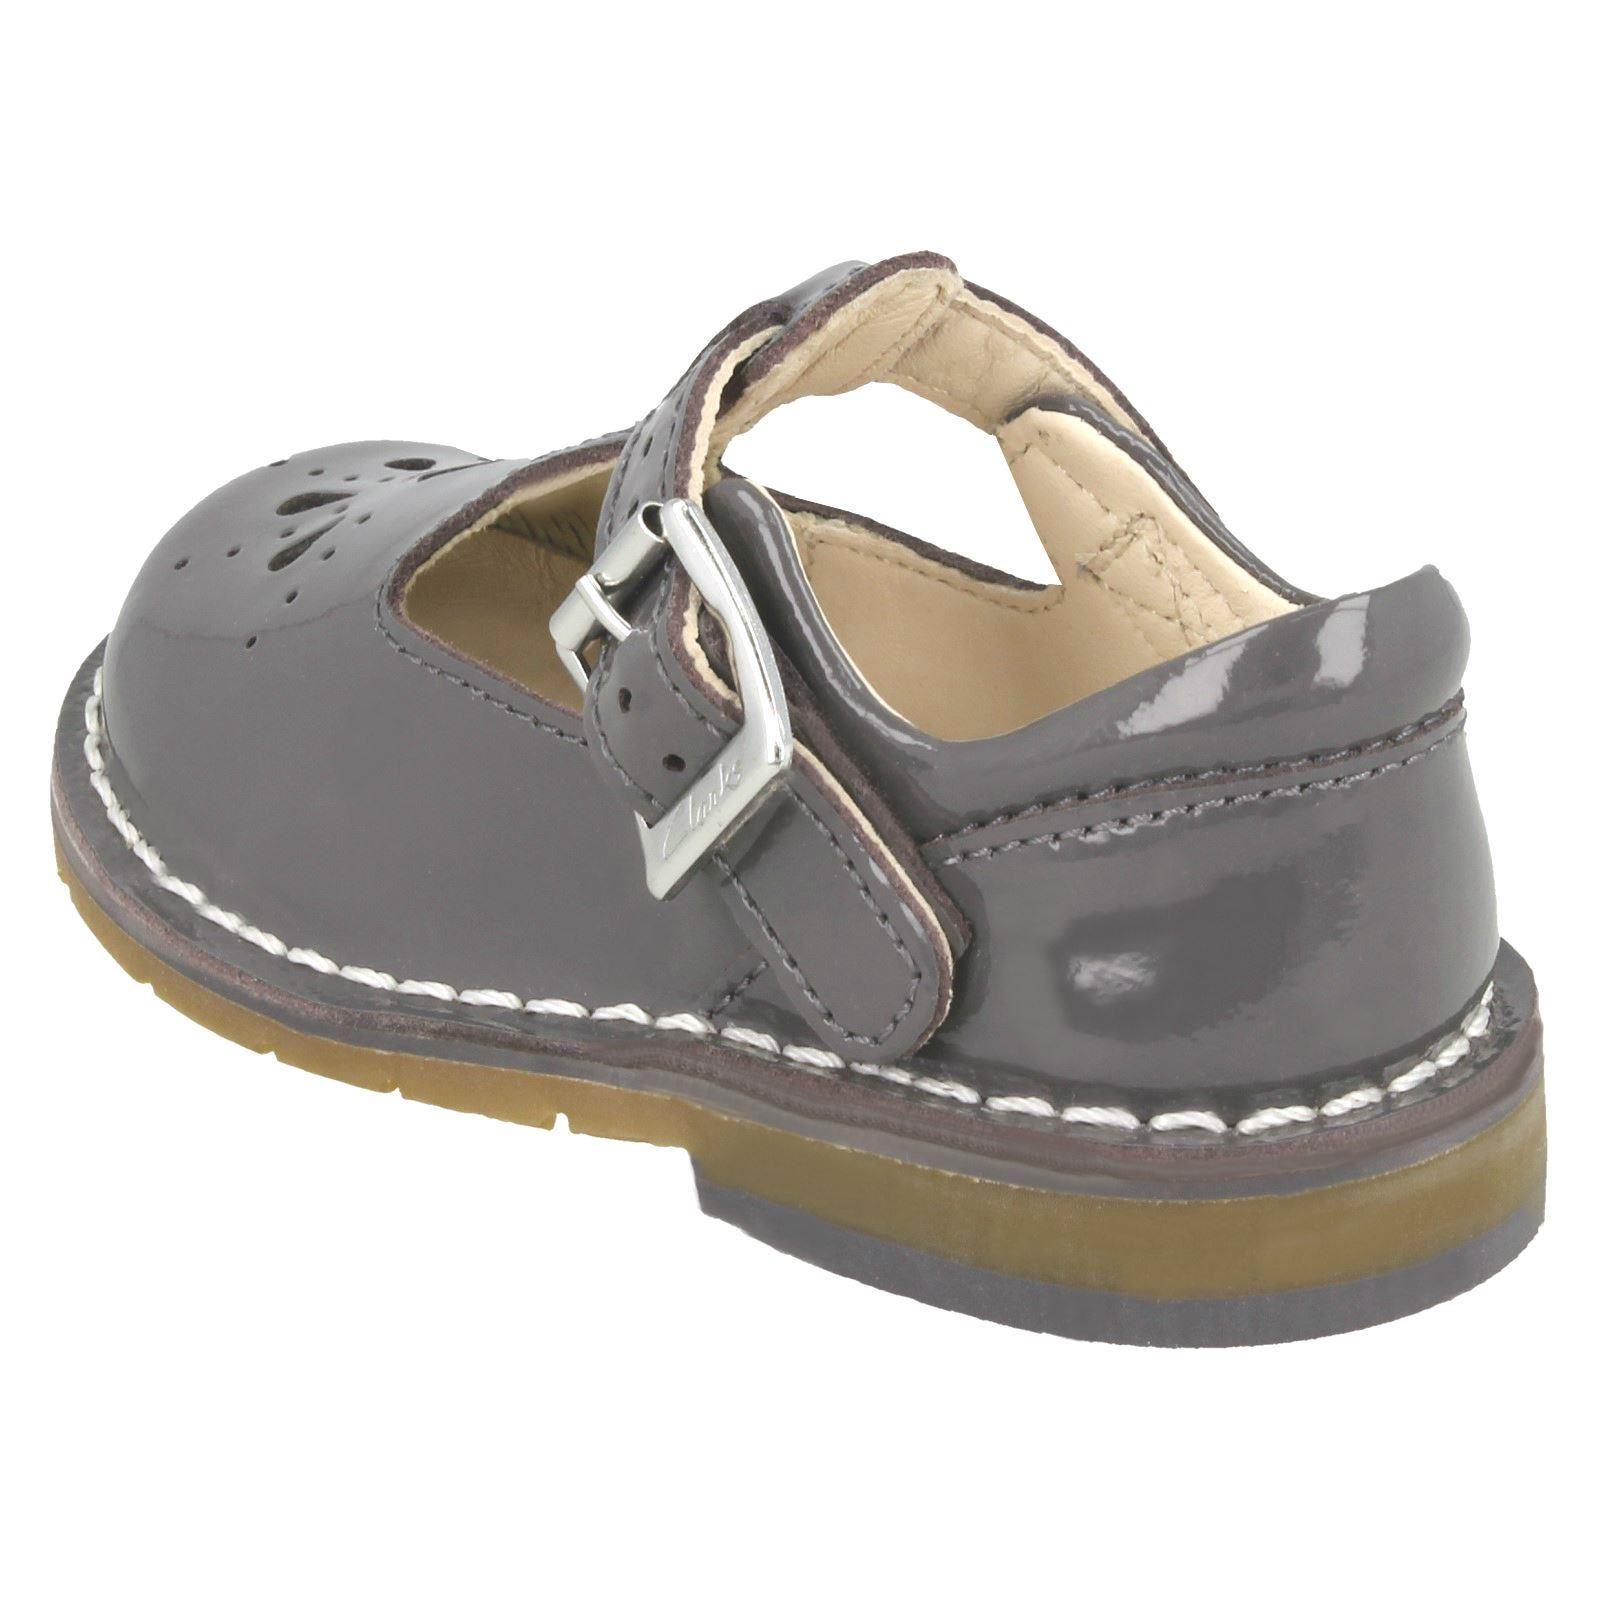 Chicas Clarks Zapatos Informales Inteligentes primera Tejido Hilo